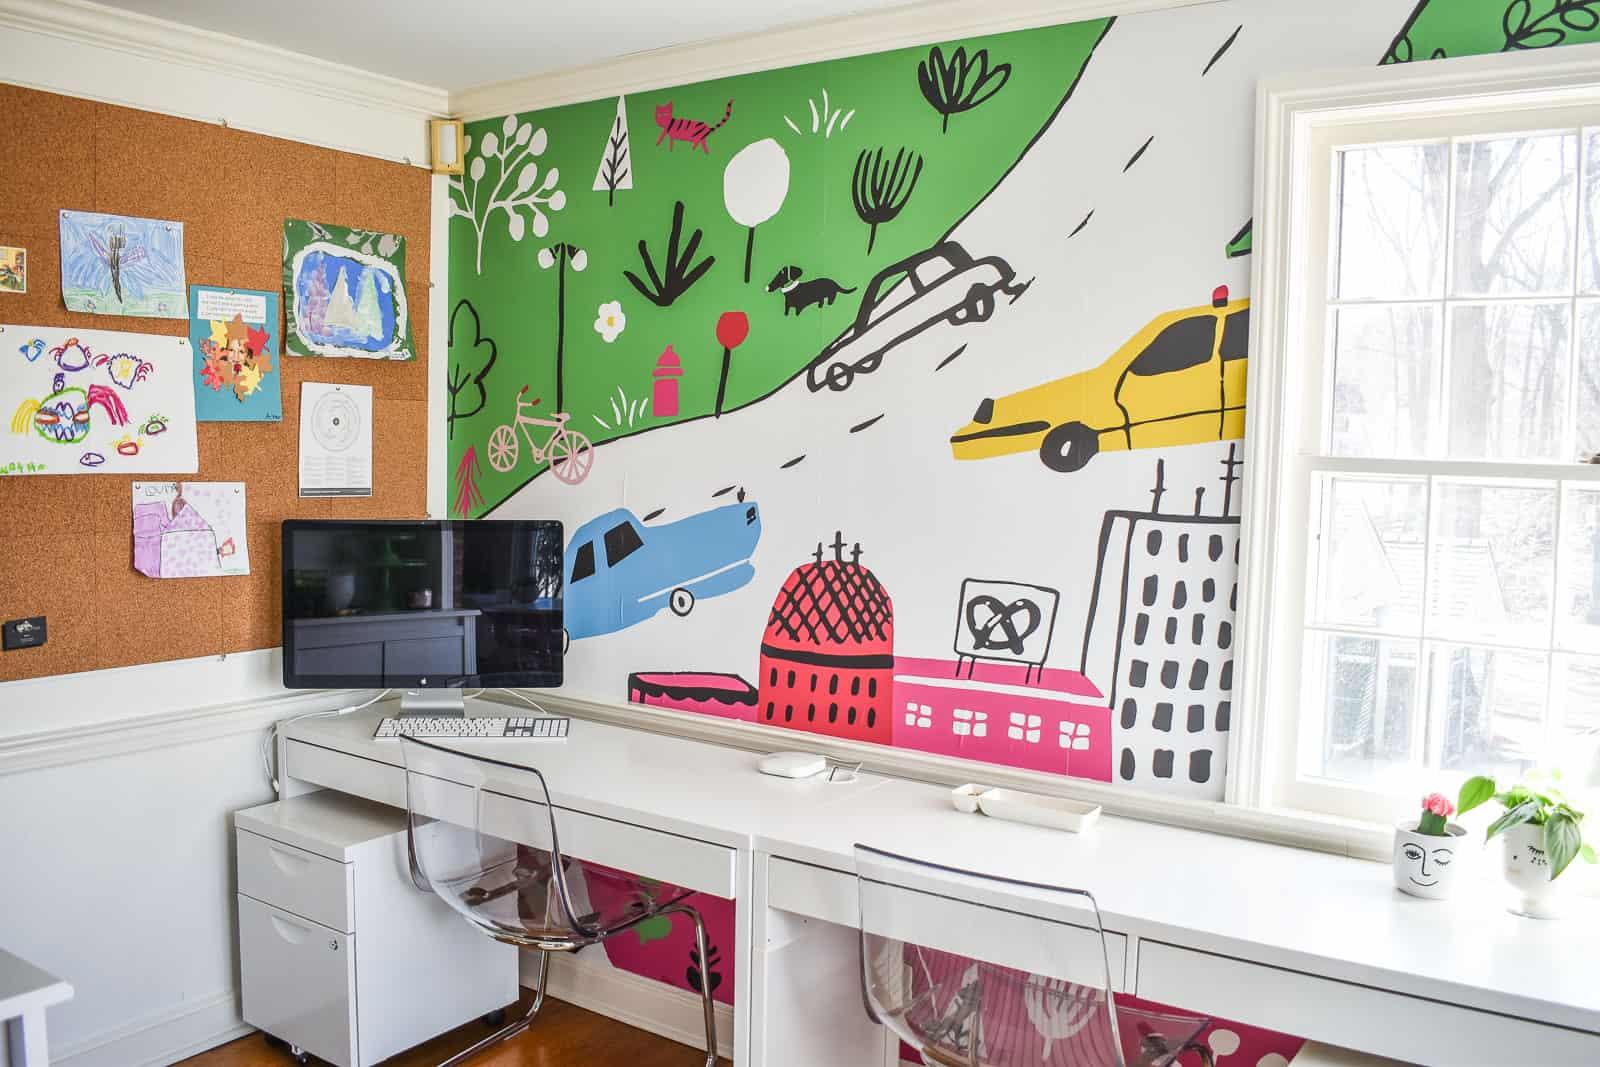 mural in homework statin